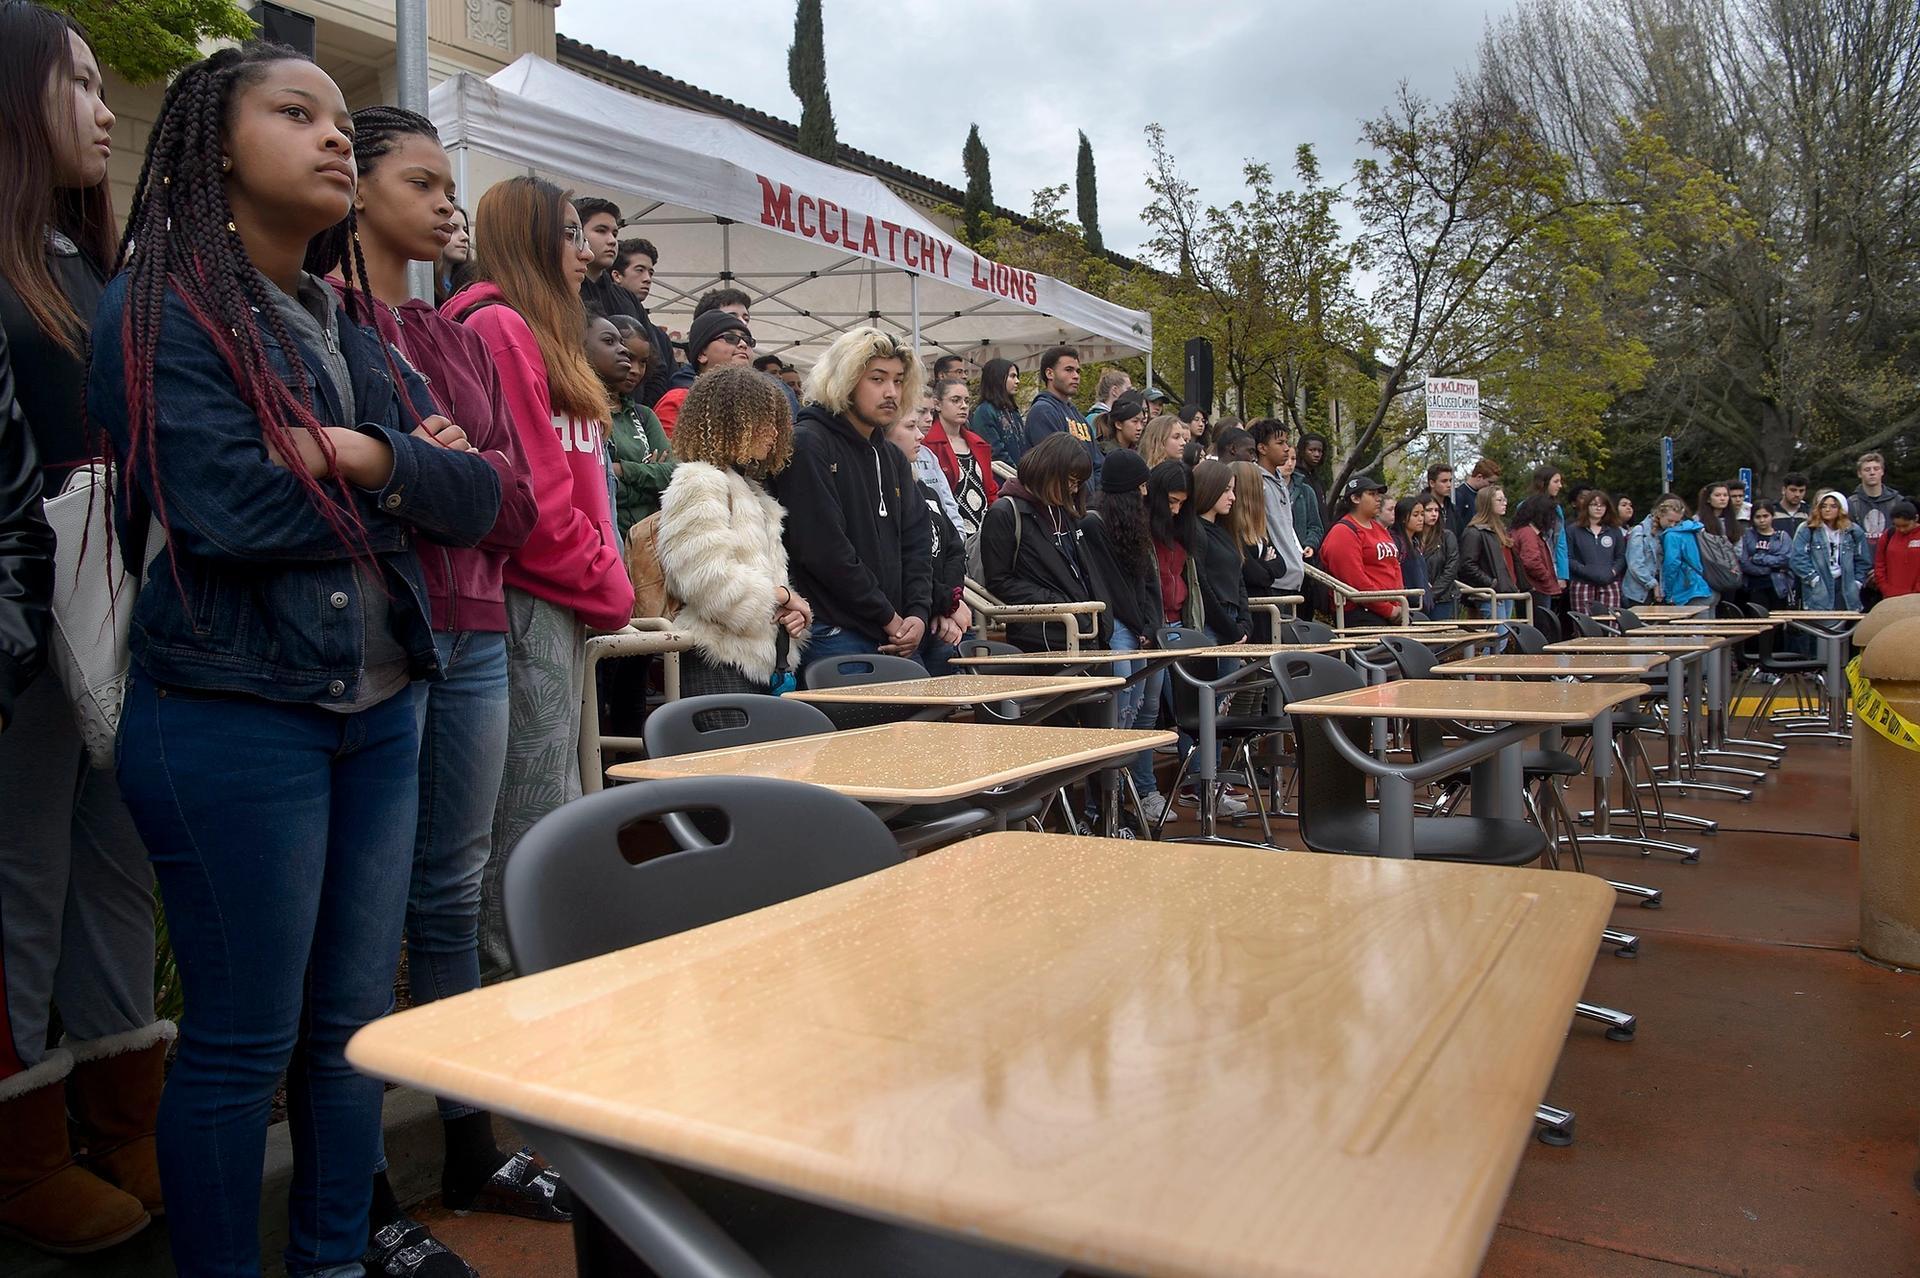 Students at McClatchy High School in Sacramento, California gather around 17 empty desks representing the shooting victims from Marjory Stoneman Douglas High School in Parkland, Florida Randall Benton/The Sacramento Bee via AP